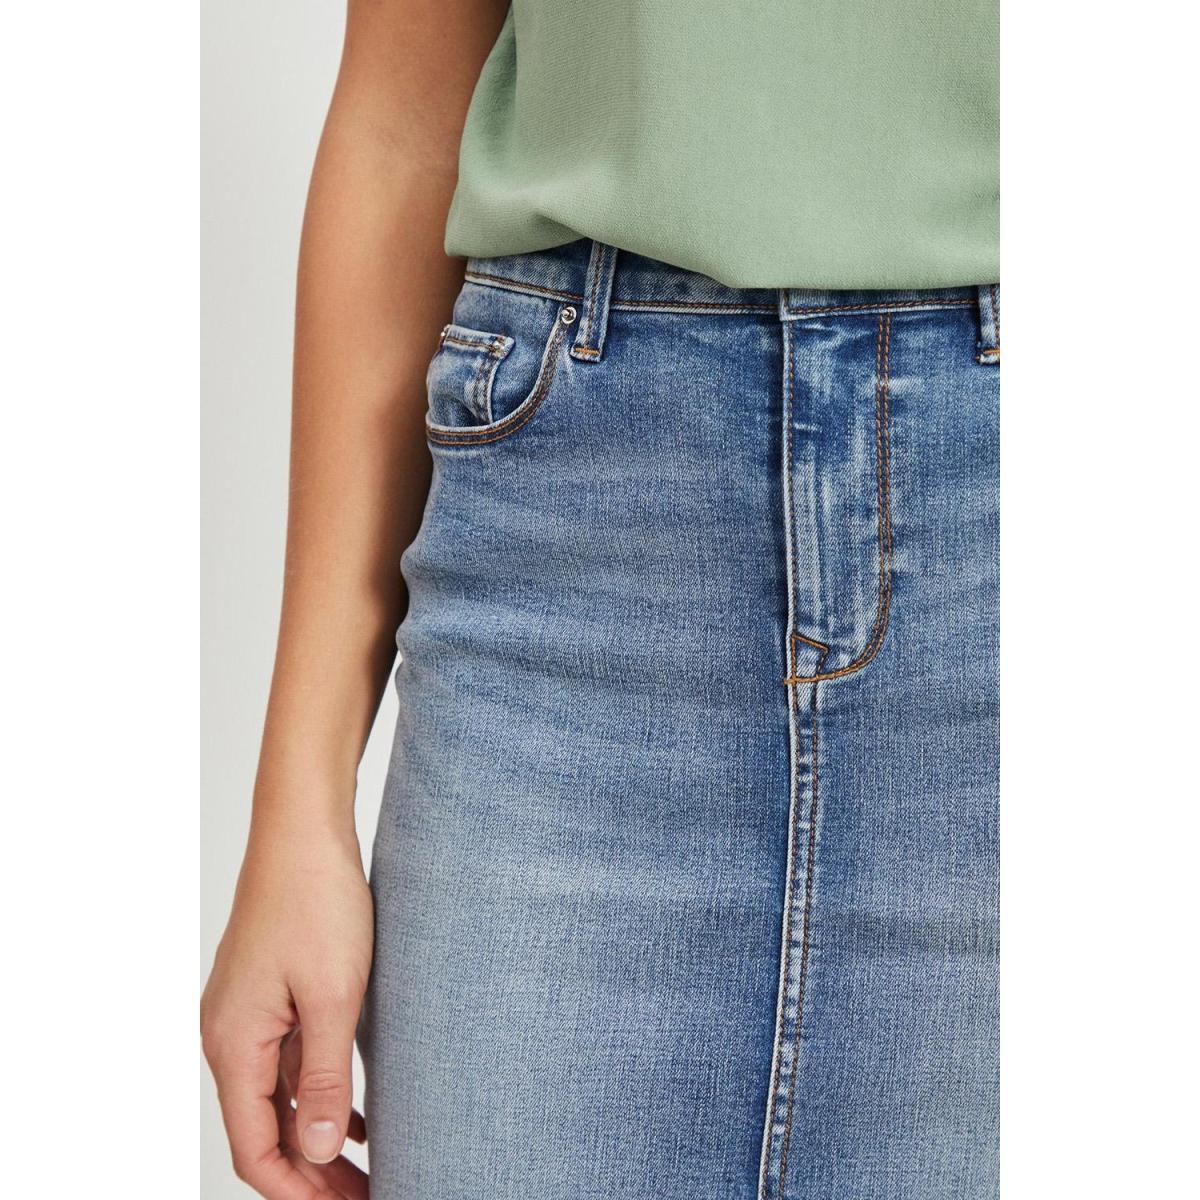 vicommit felicia short skirt lb-noo 14055251 vila rok light blue denim